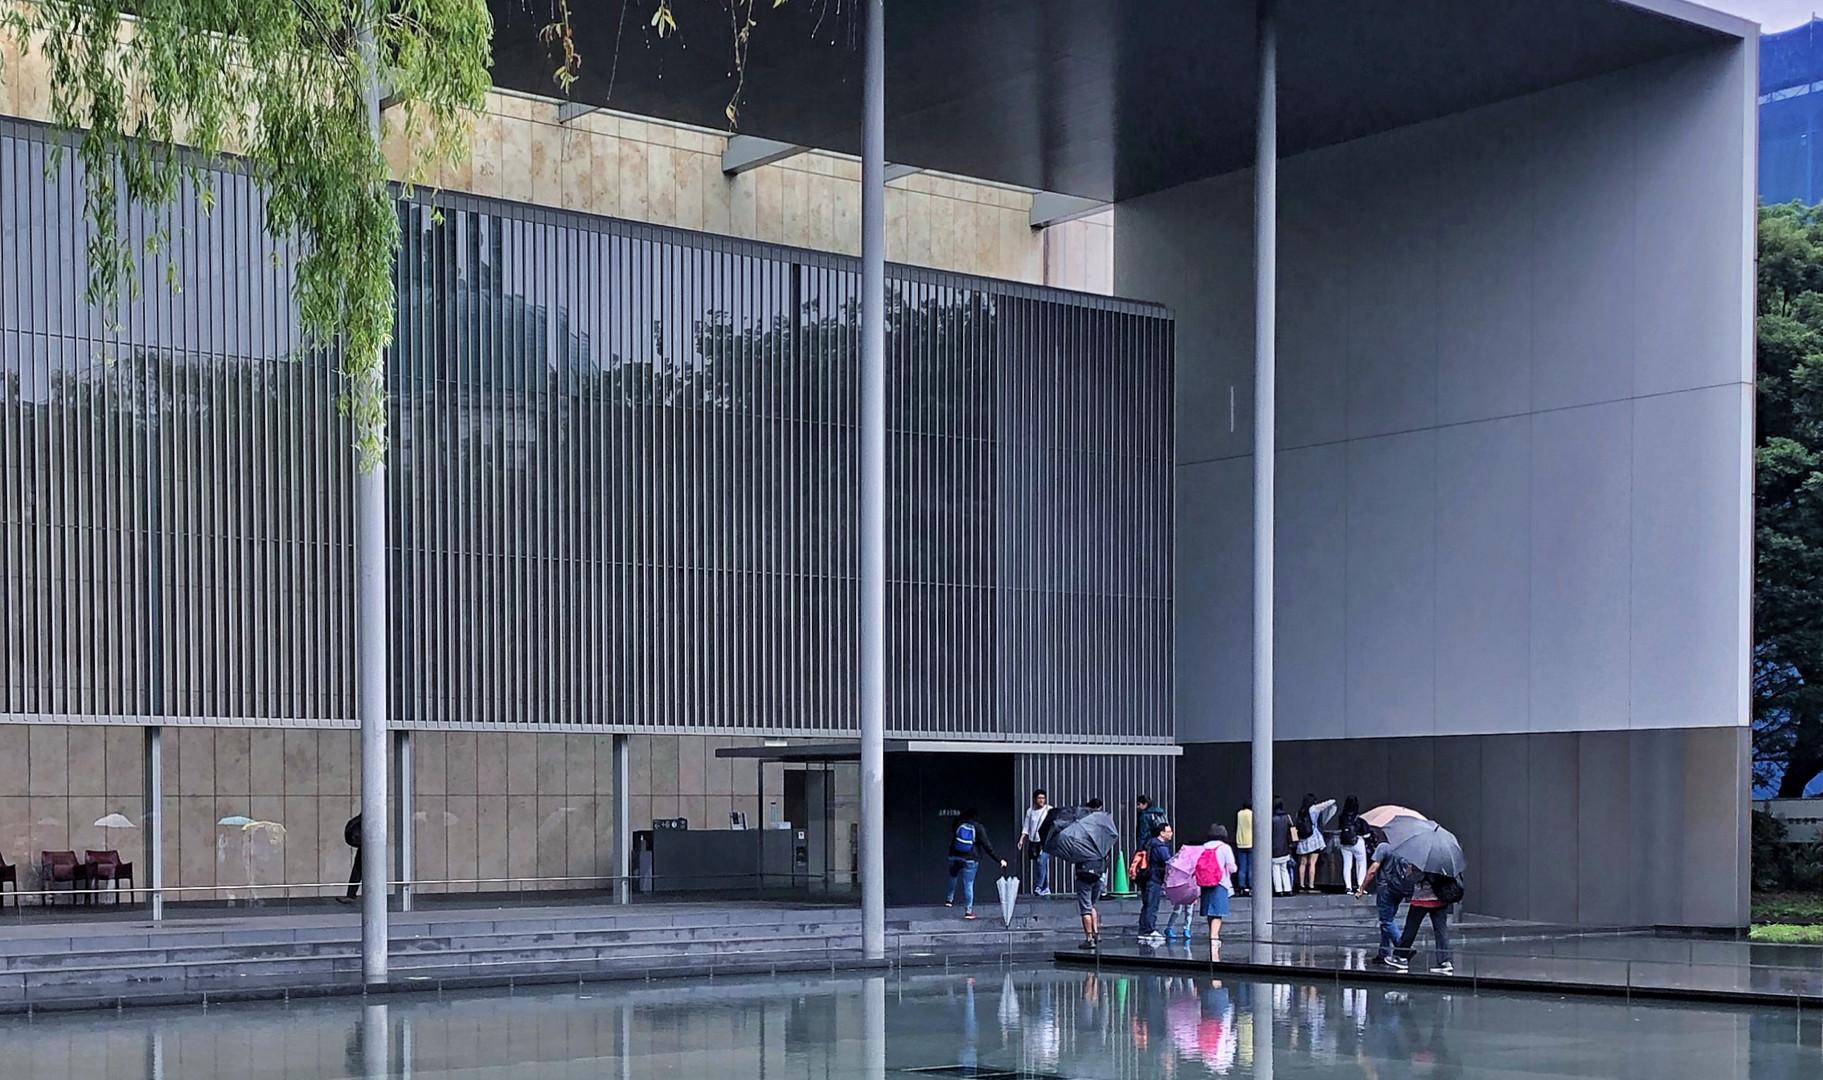 Gallery of Horyuji Treasures; designed by Yoshio Taniguchi